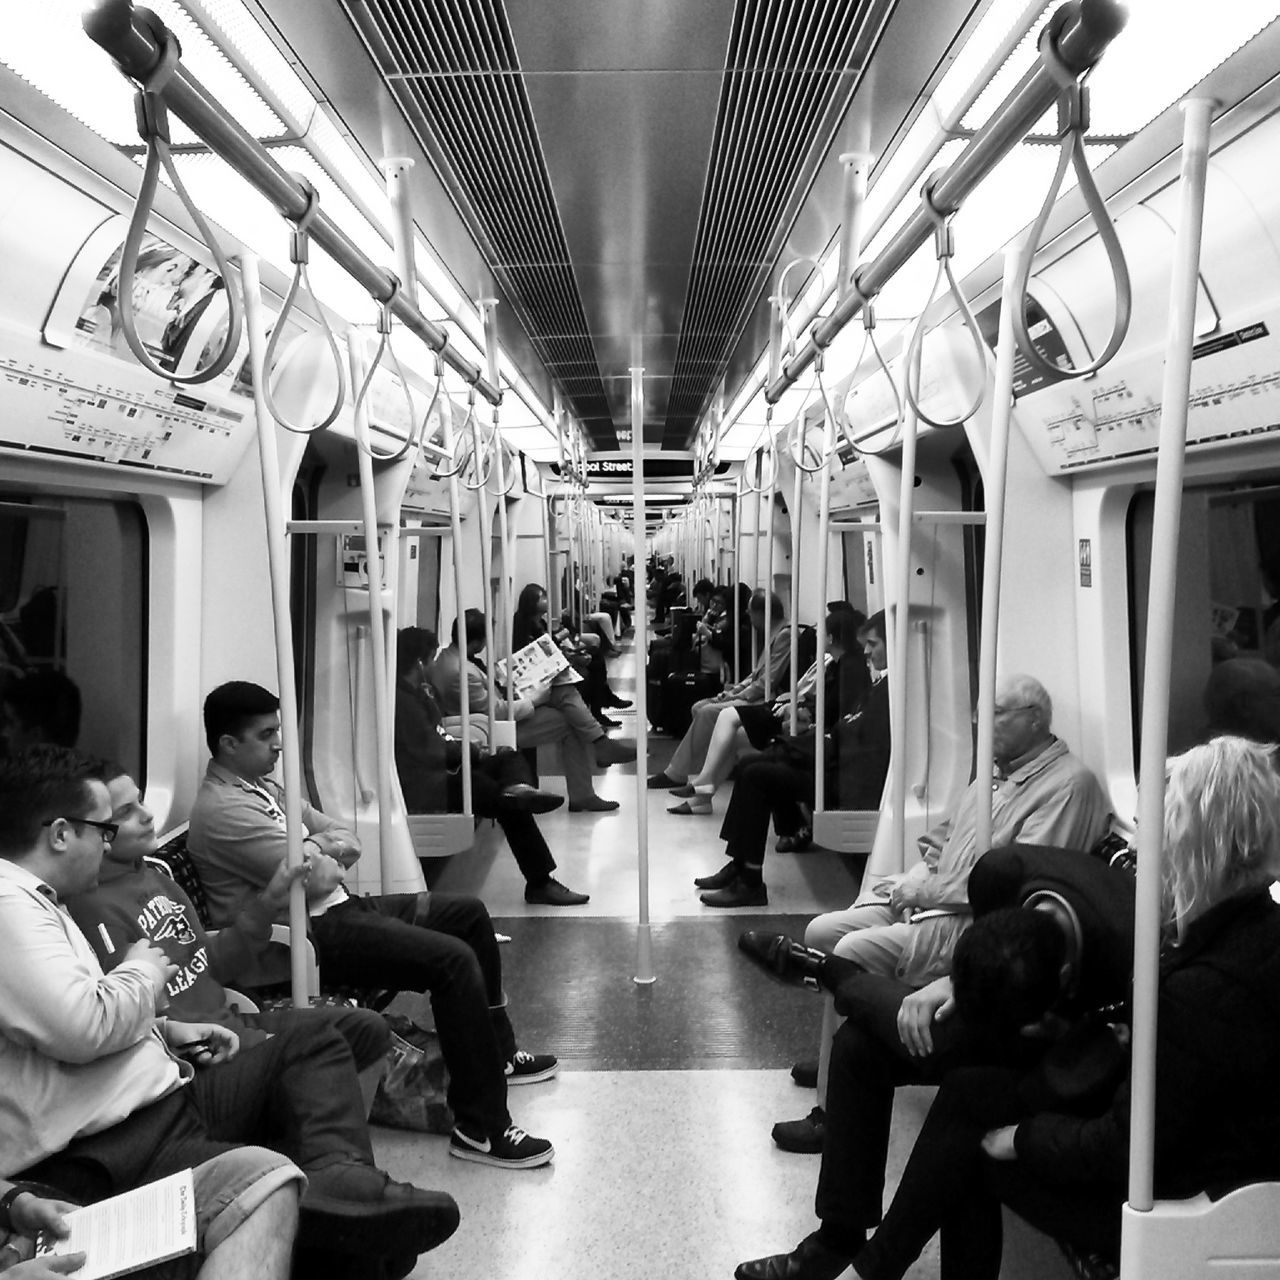 Indoors  Men People Tube LondonTransport LondonTube Blackandwhite Black & White Tranportation London Italianphotographer Transportation EyeEm Best Shots EyEmNewHere EyeEmNewHere